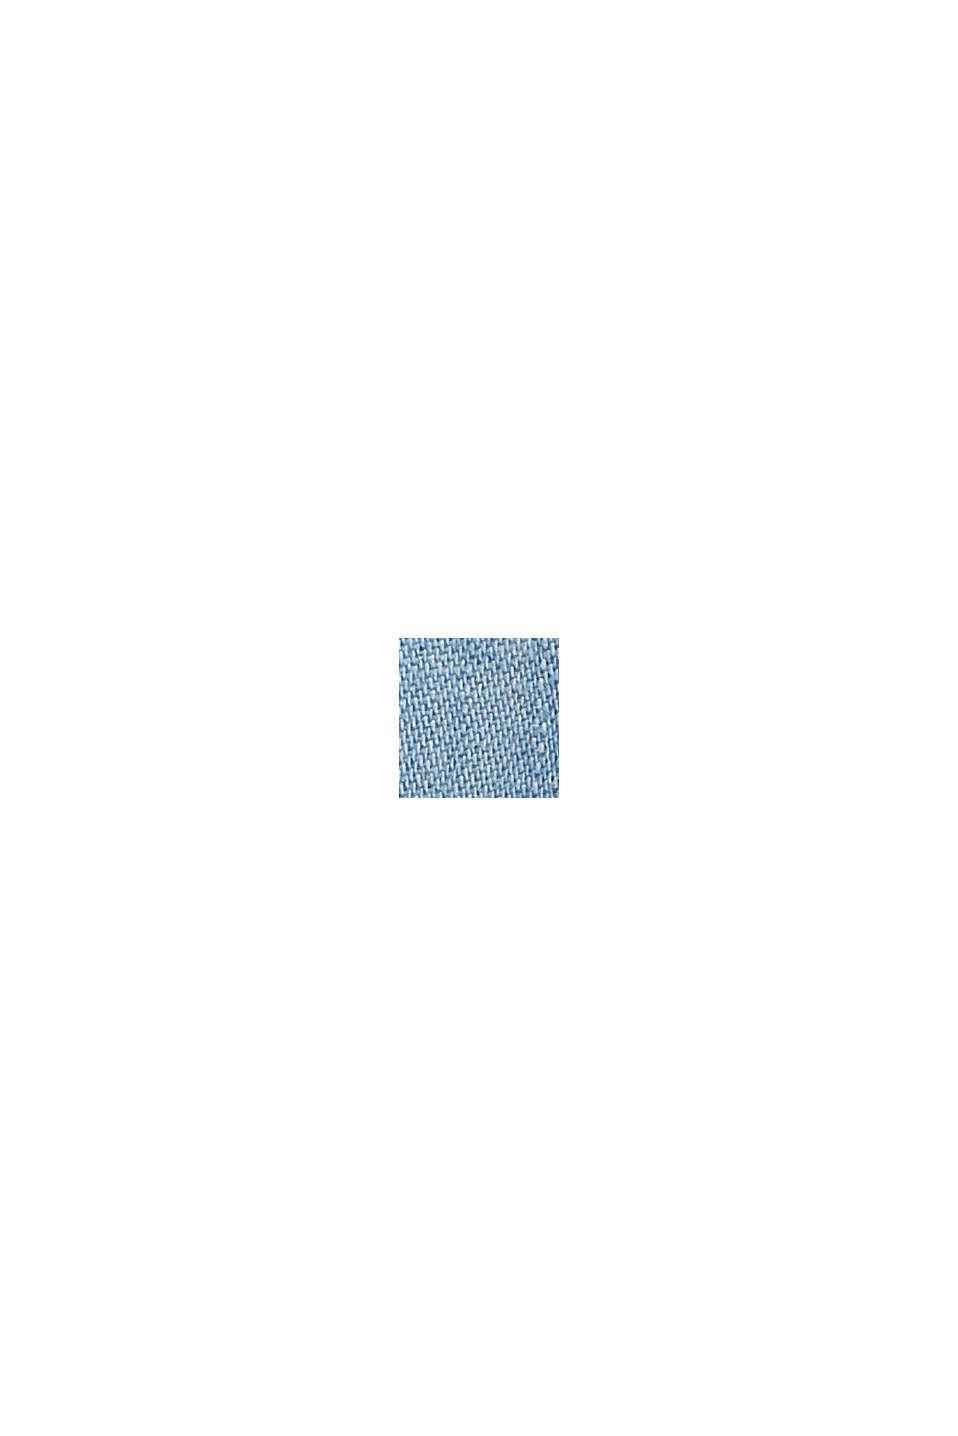 En TENCEL™: pantalón deportivo con acabado vaquero, BLUE BLEACHED, swatch